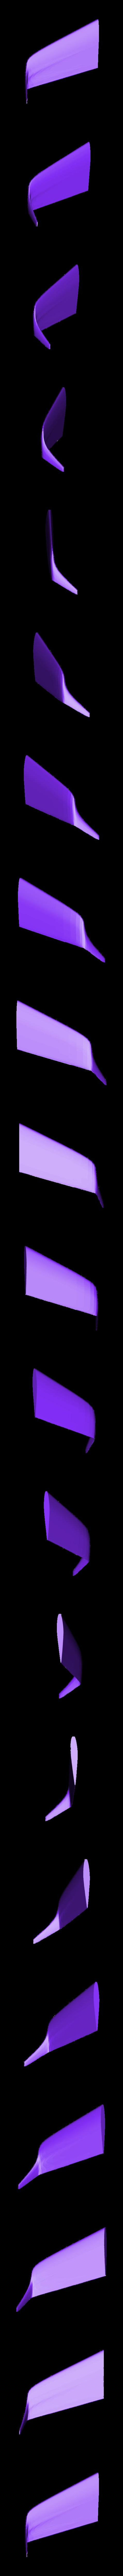 Wing3_L.STL Download STL file Phenom 300 • Template to 3D print, Eduardohbm